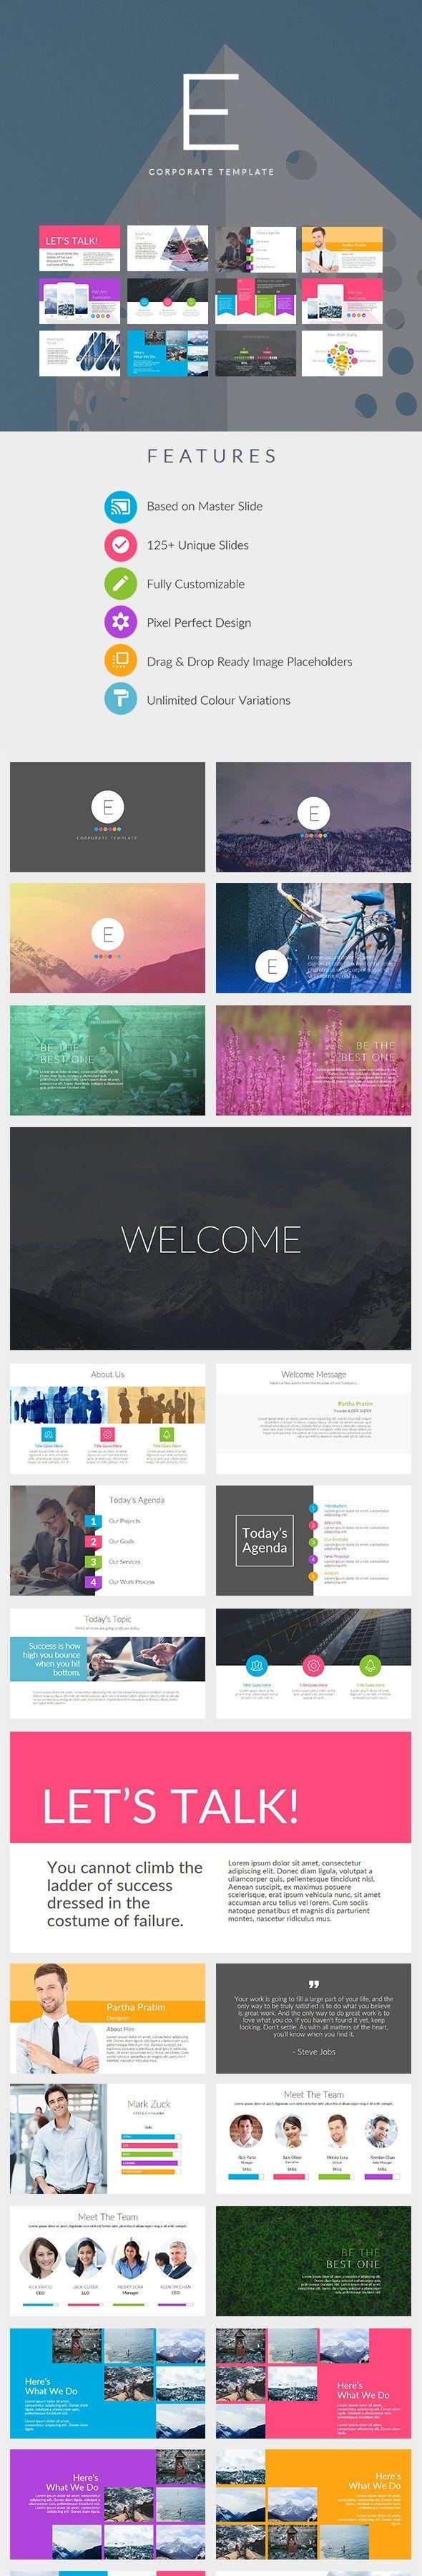 E Powerpoint Pinterest Business Plan Presentation Powerpoint